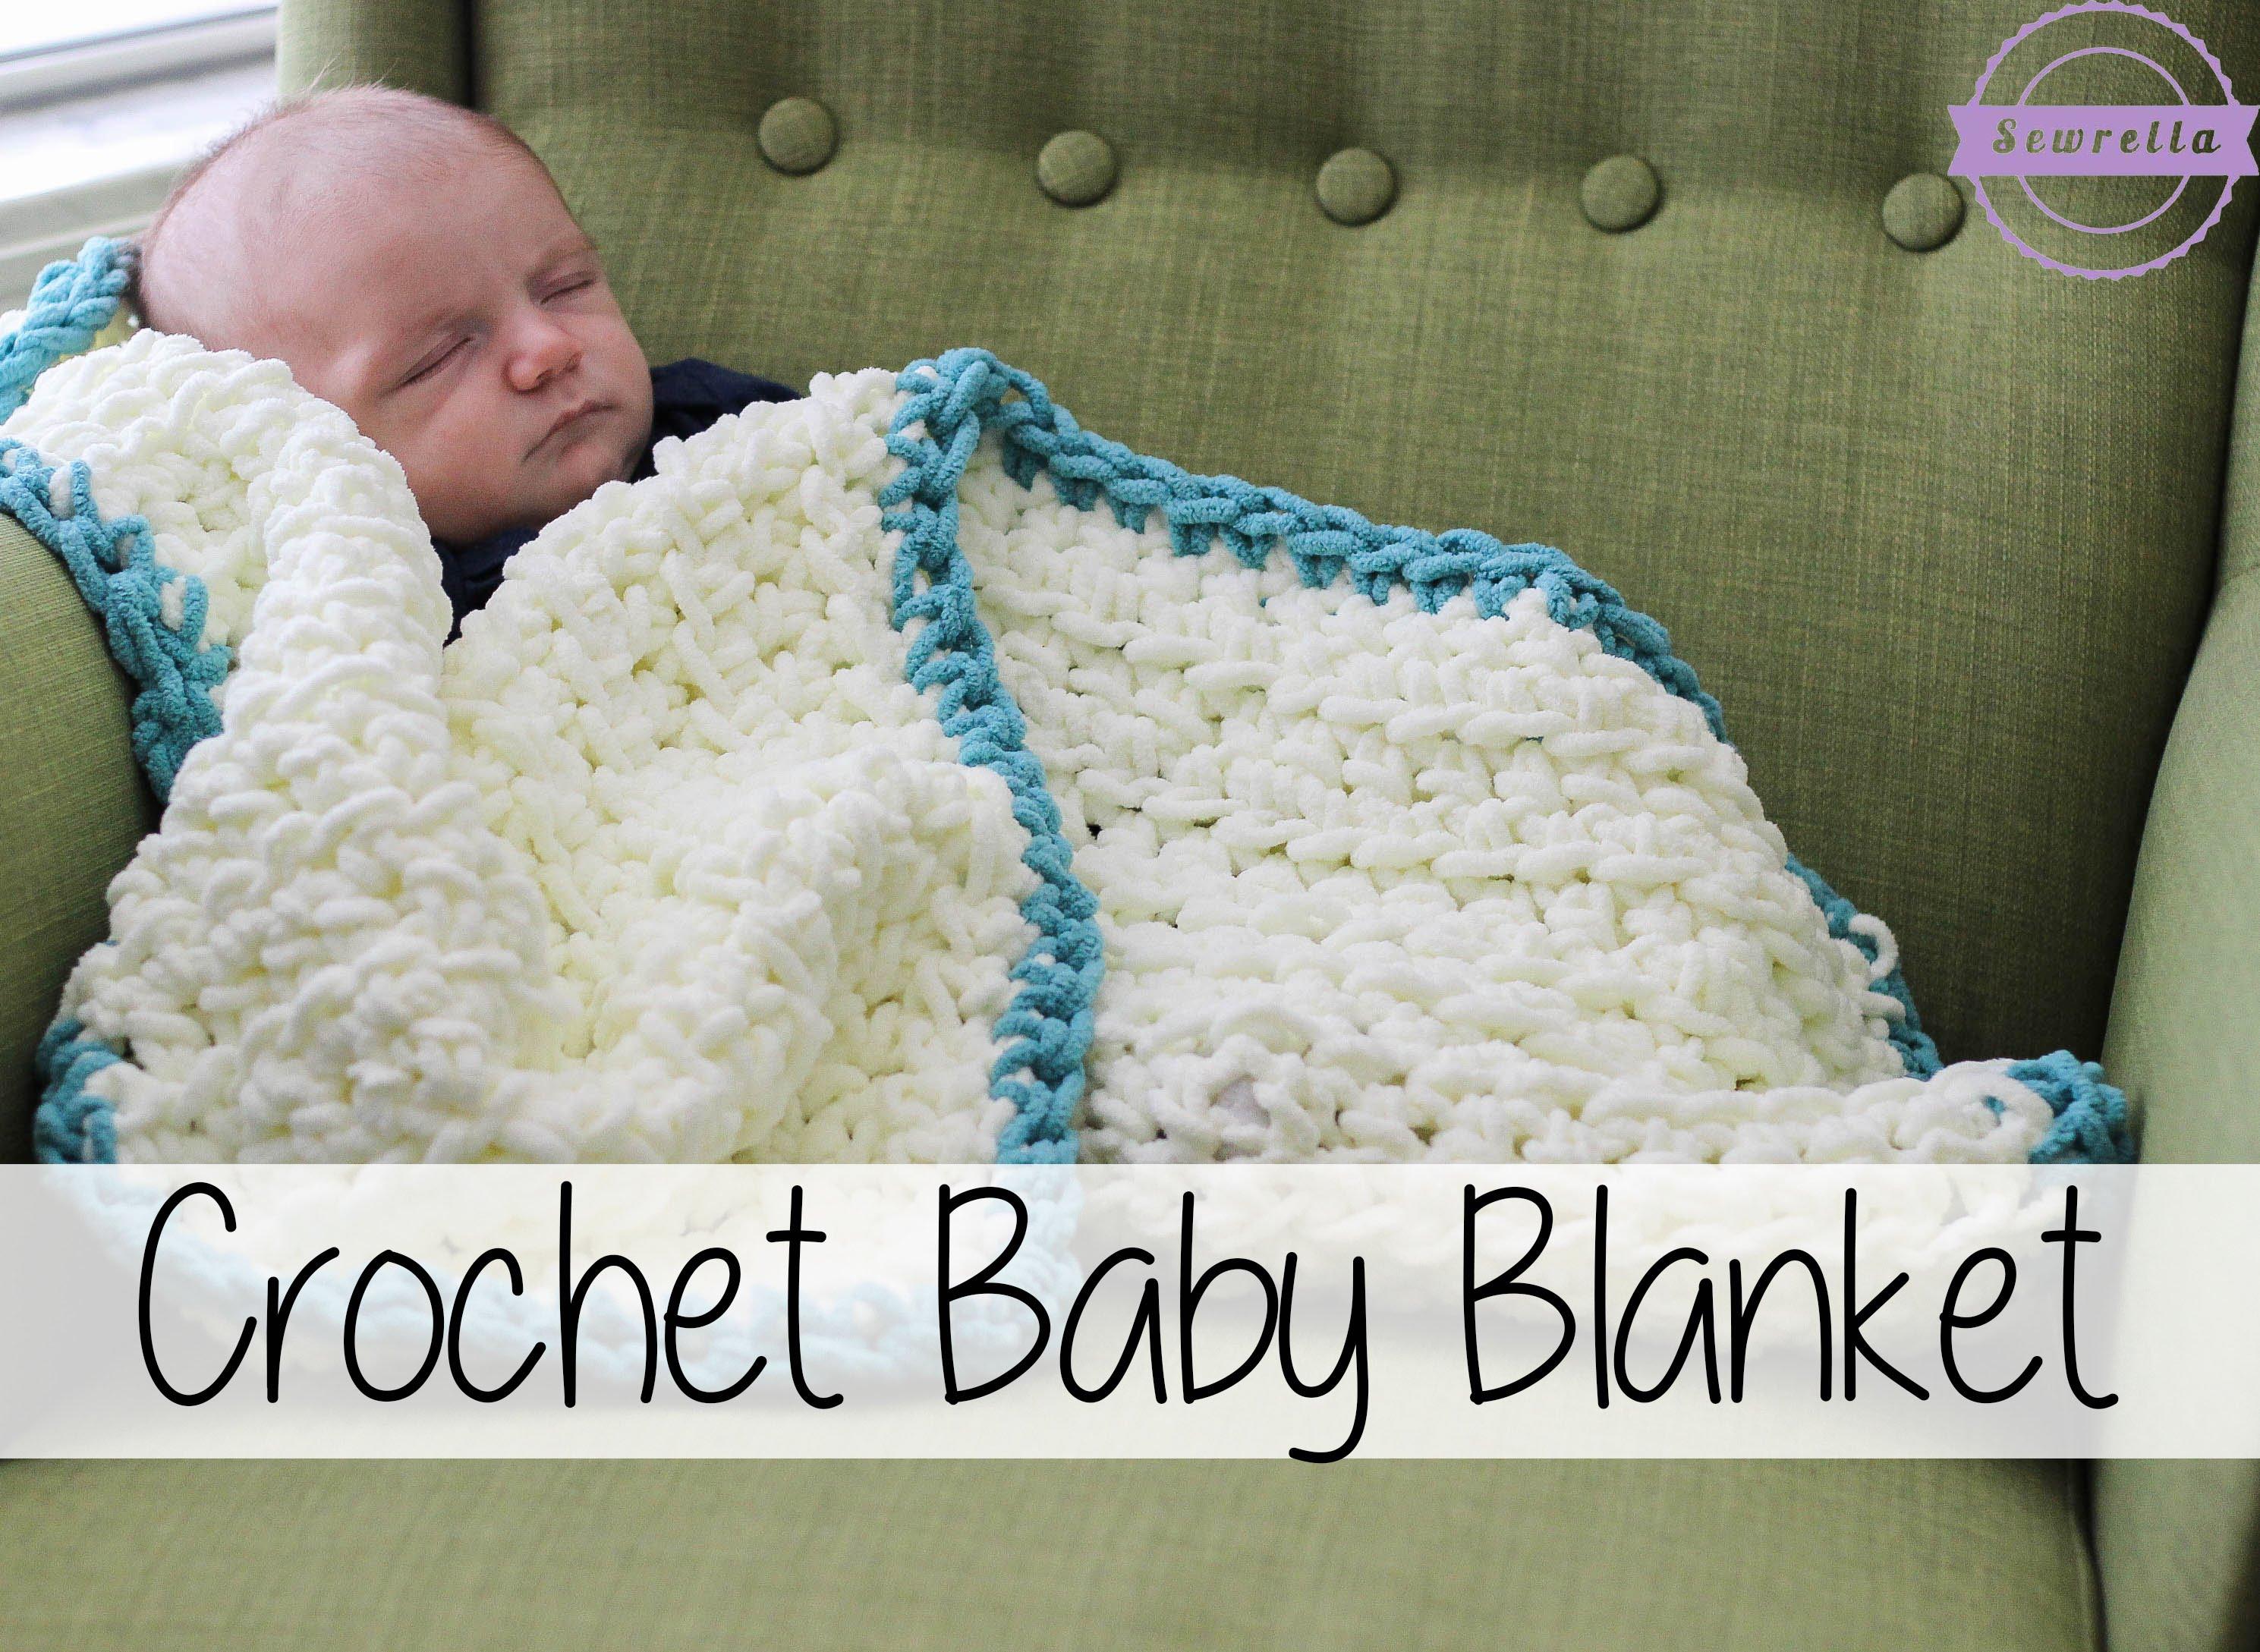 Begginer Crochet Projects Baby Blankets Easy Beginner Crochet Ba Blanket Sewrella Youtube